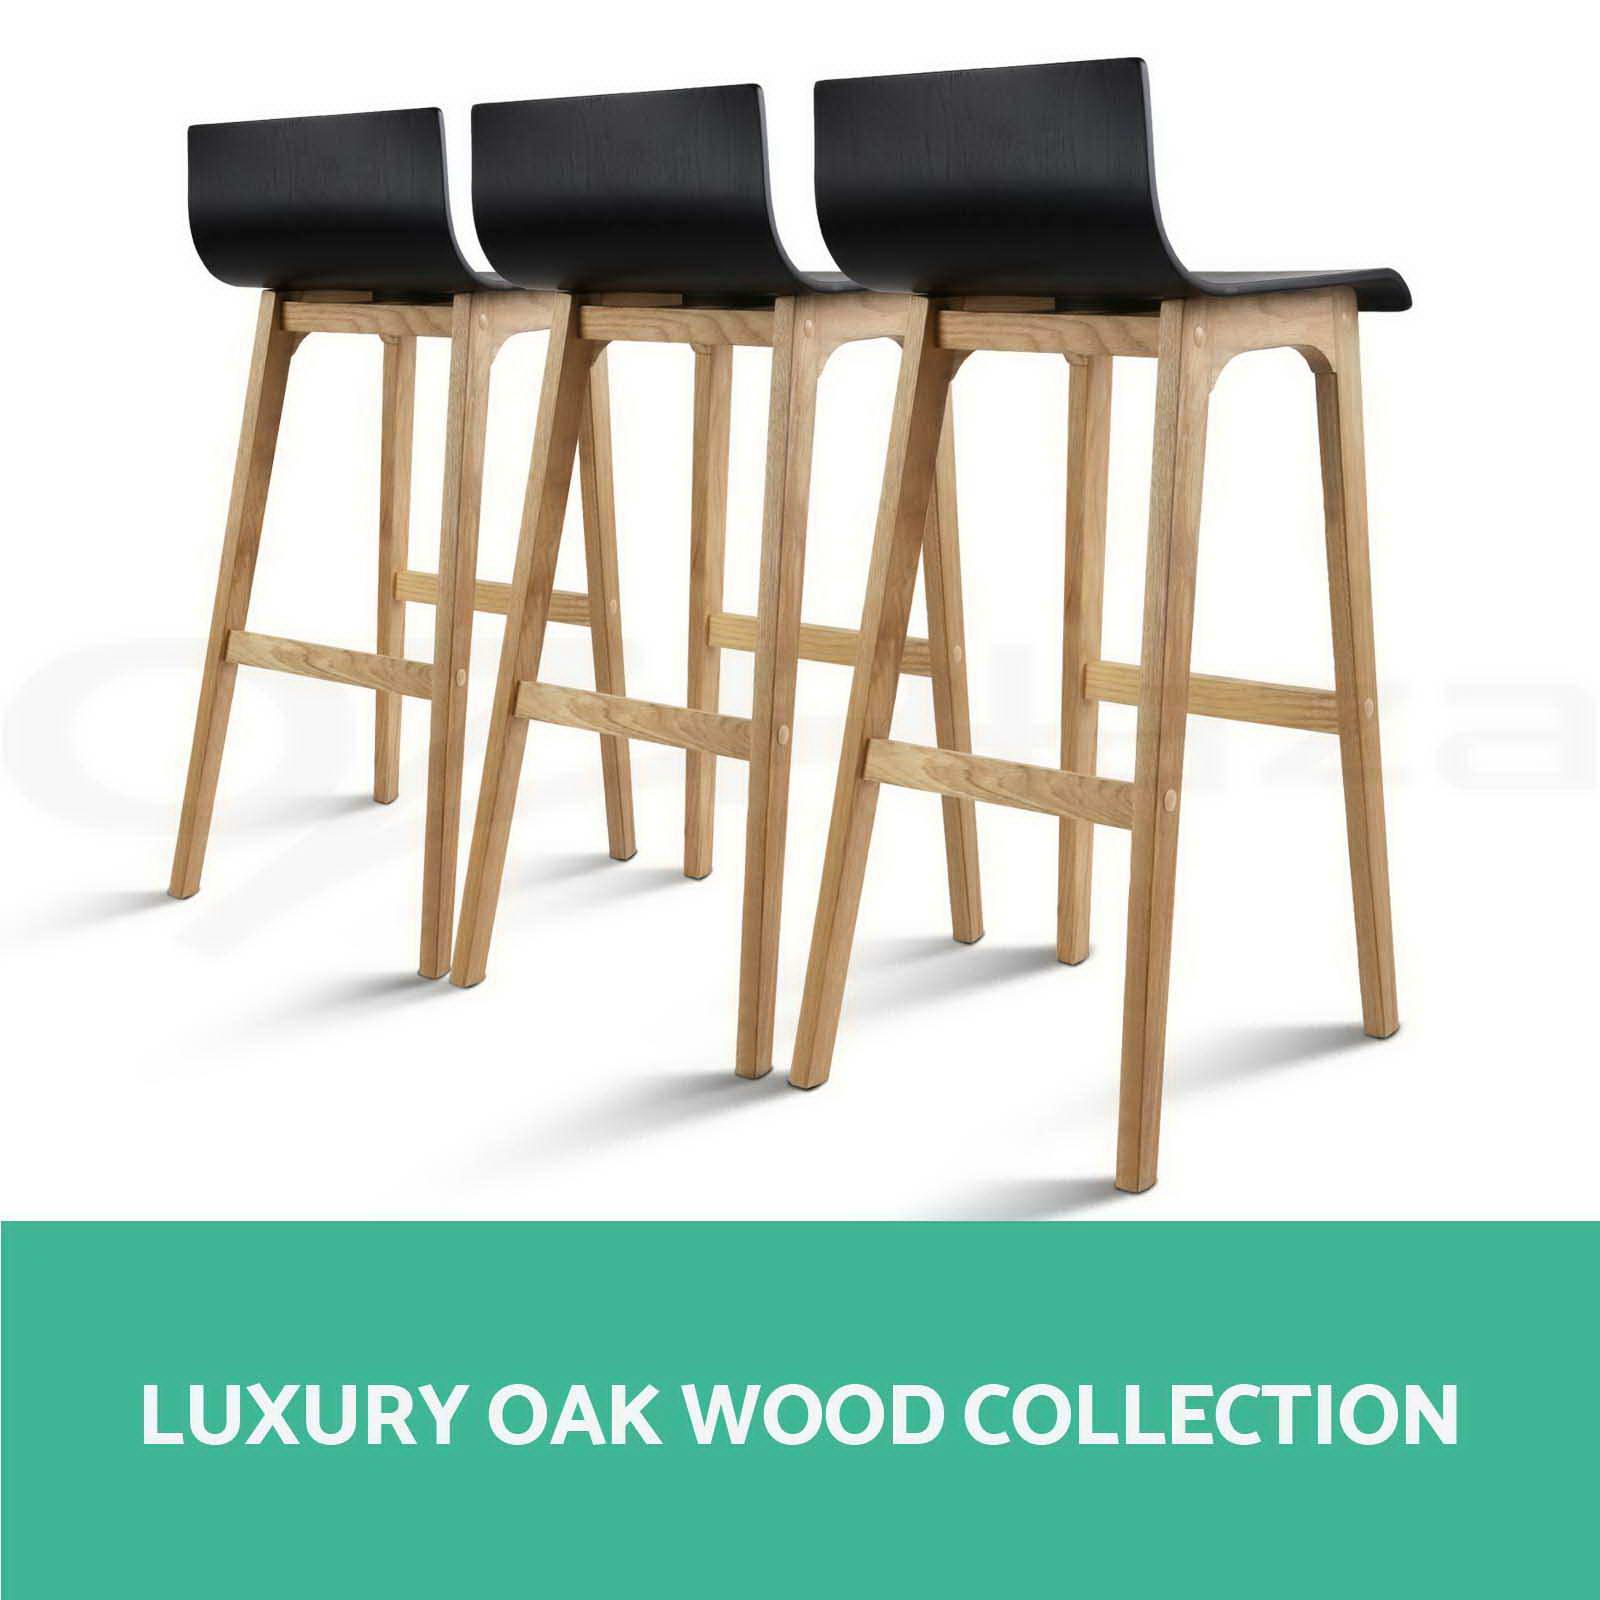 Oak Wood Stools ~ Oak wood bar stools wooden barstool dining chairs